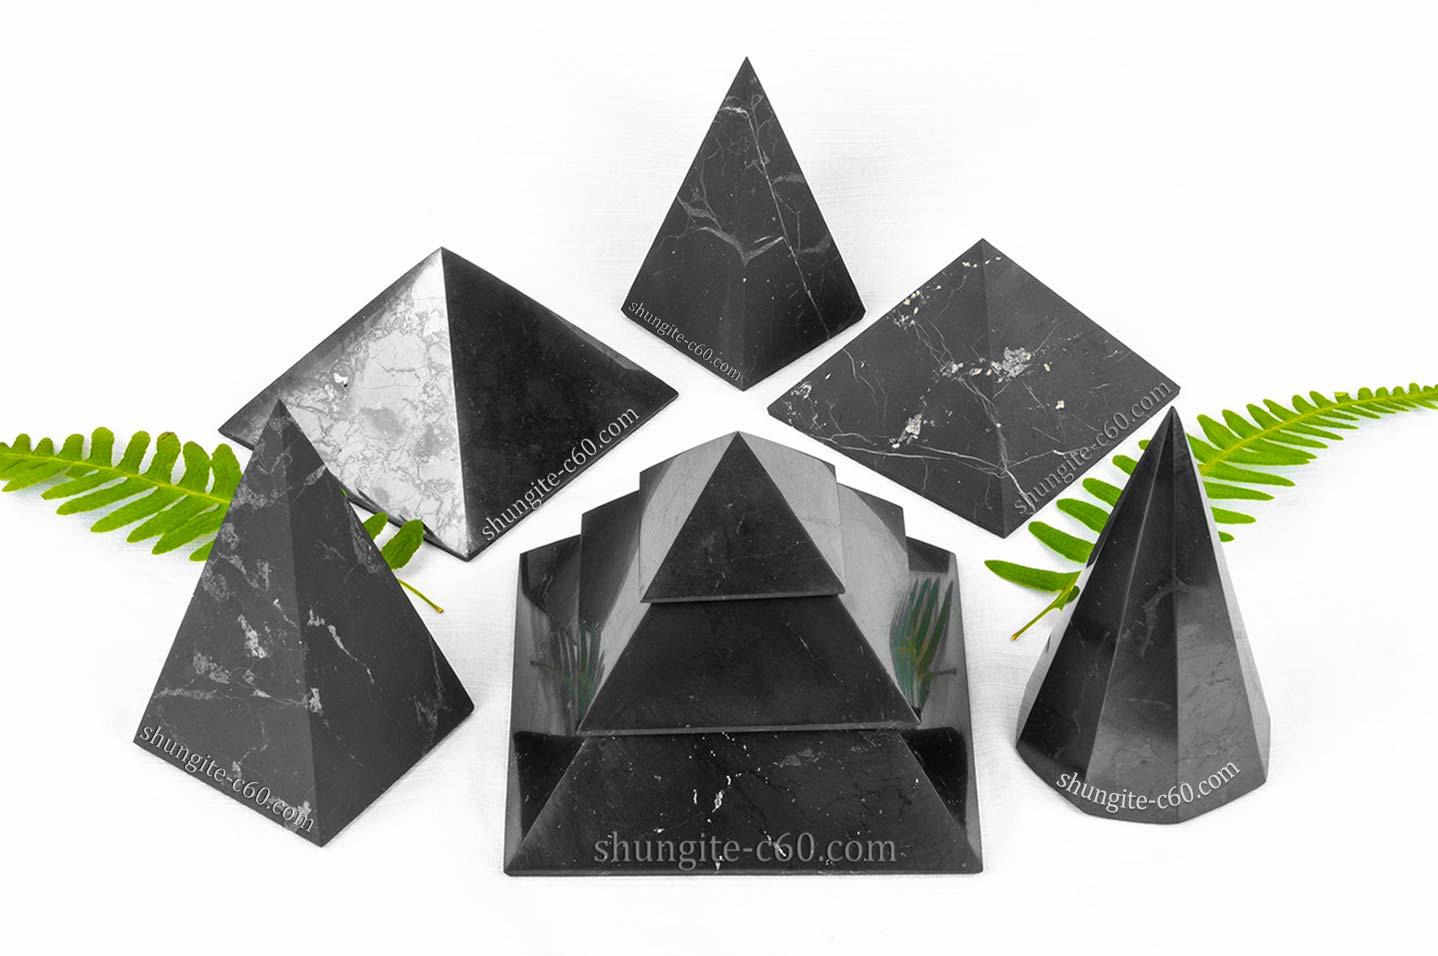 different Shungite stone pyramids